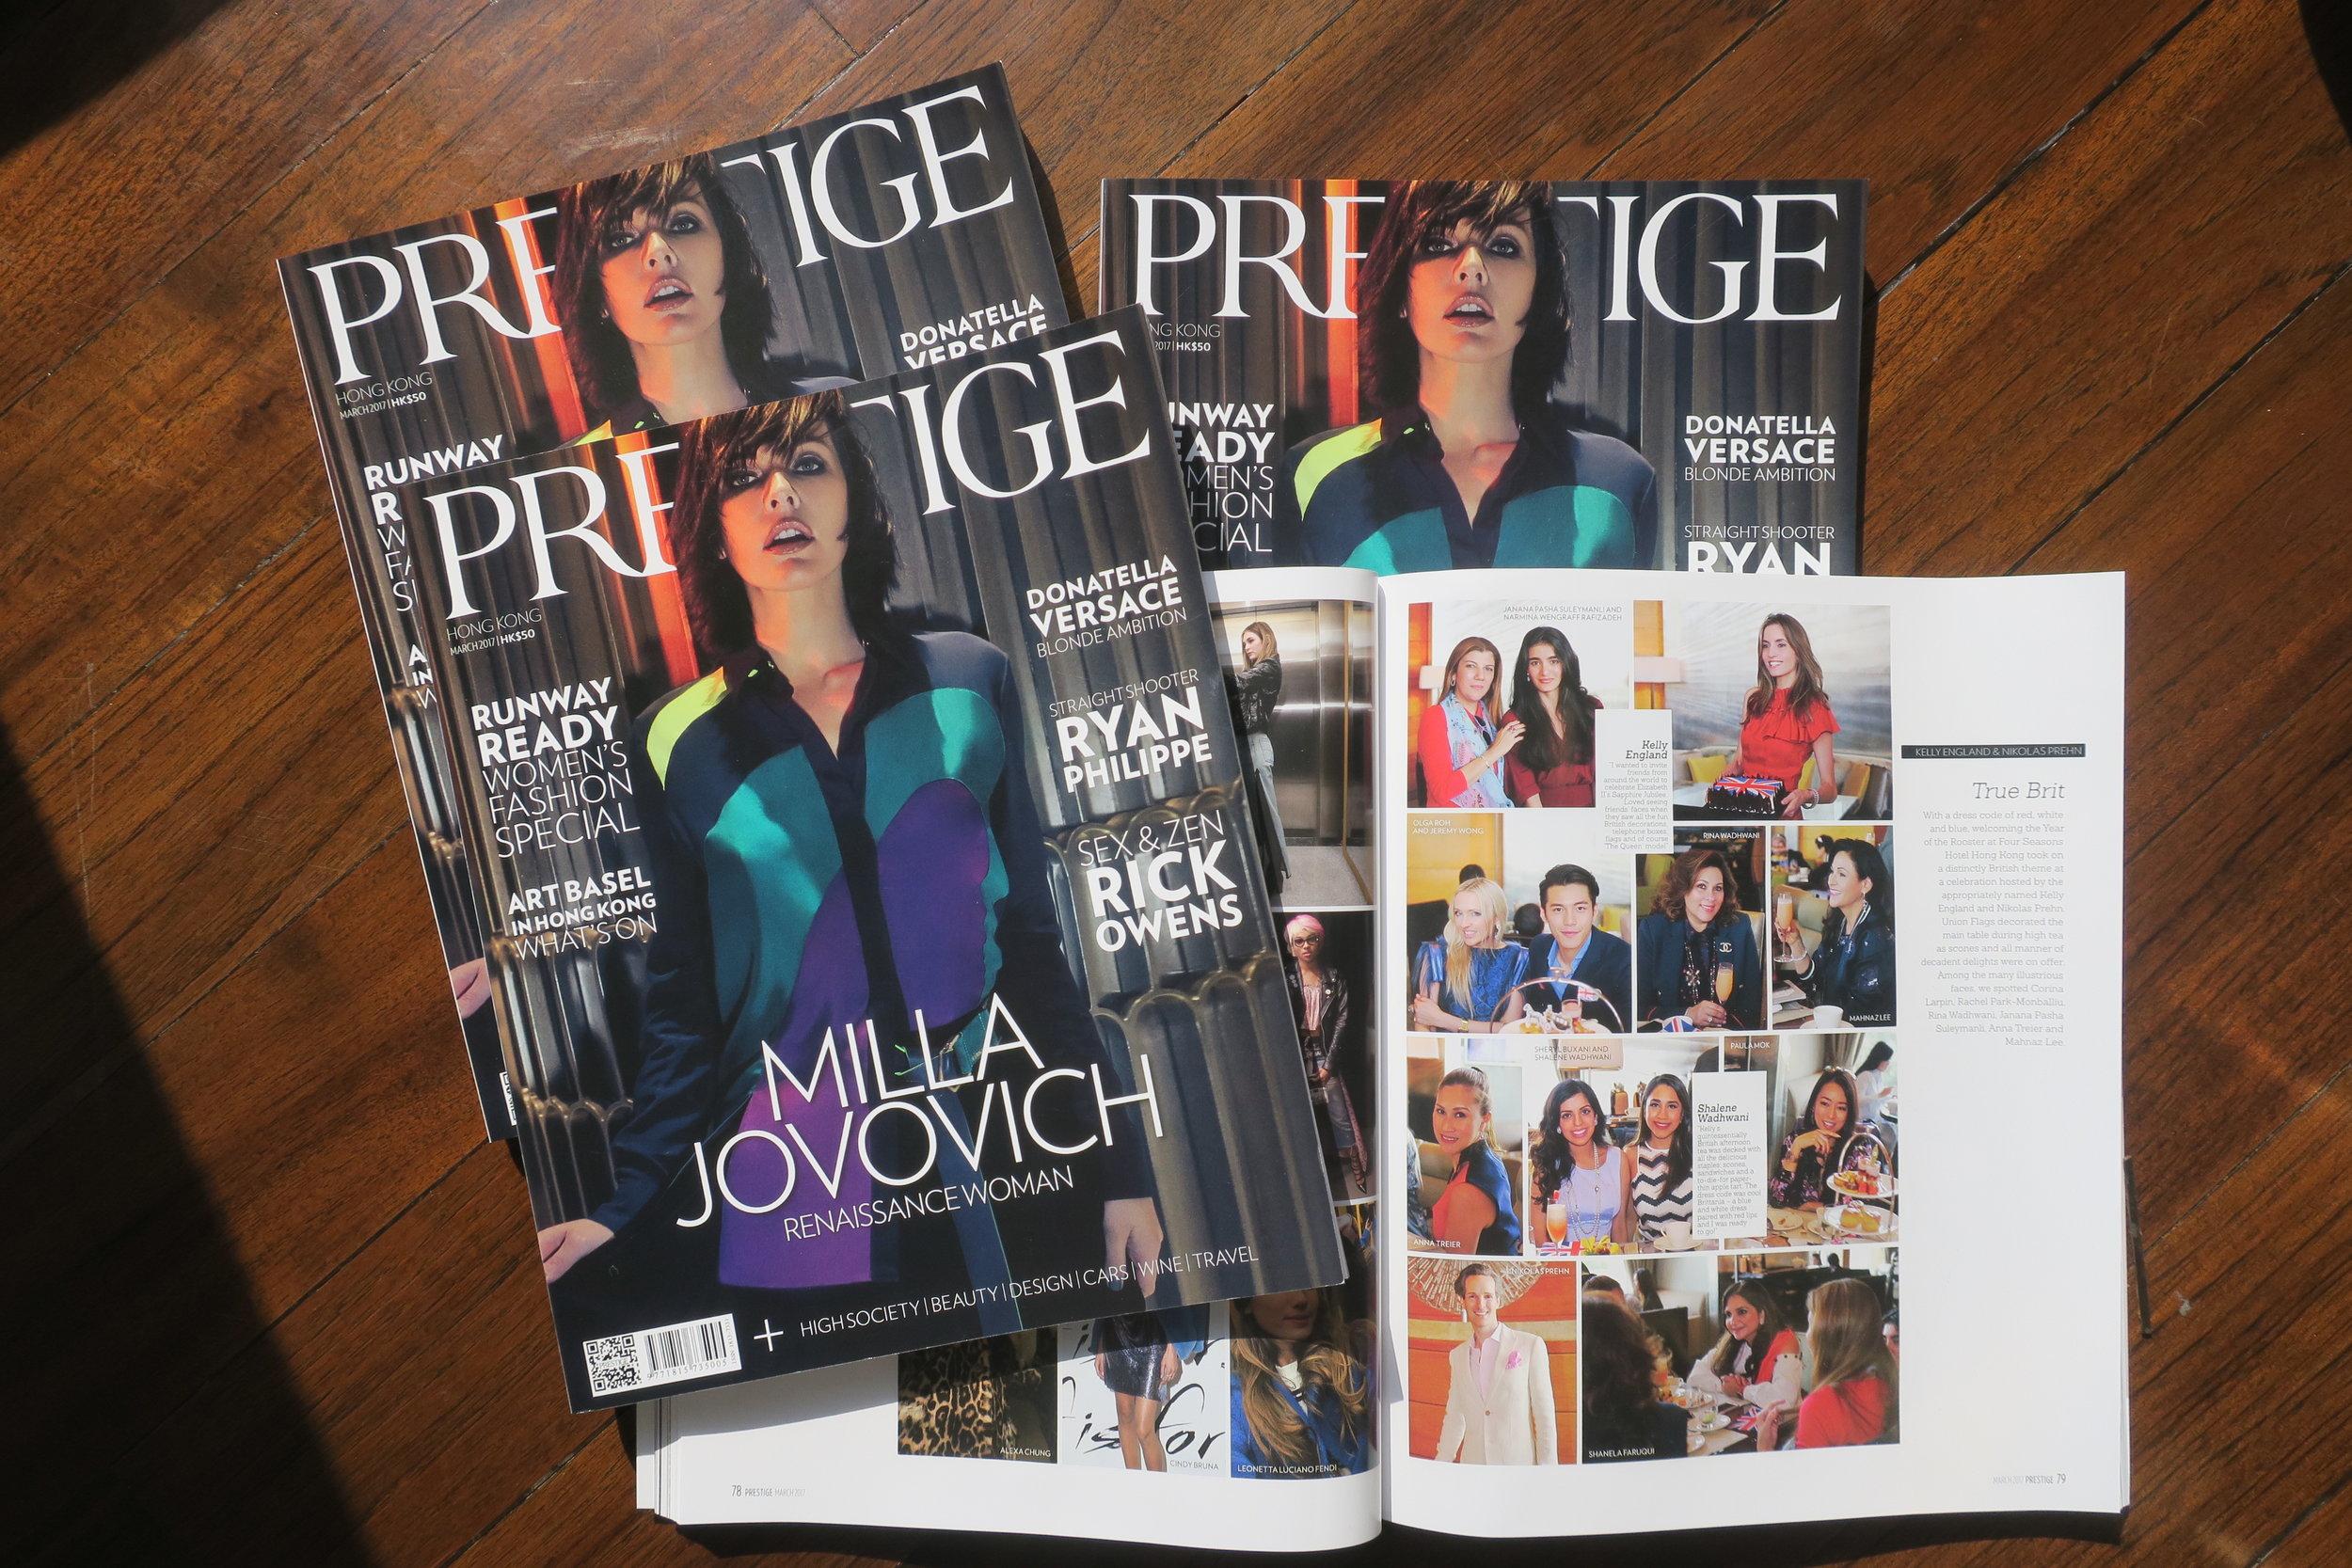 kelly-england-prehn-prestige.JPG